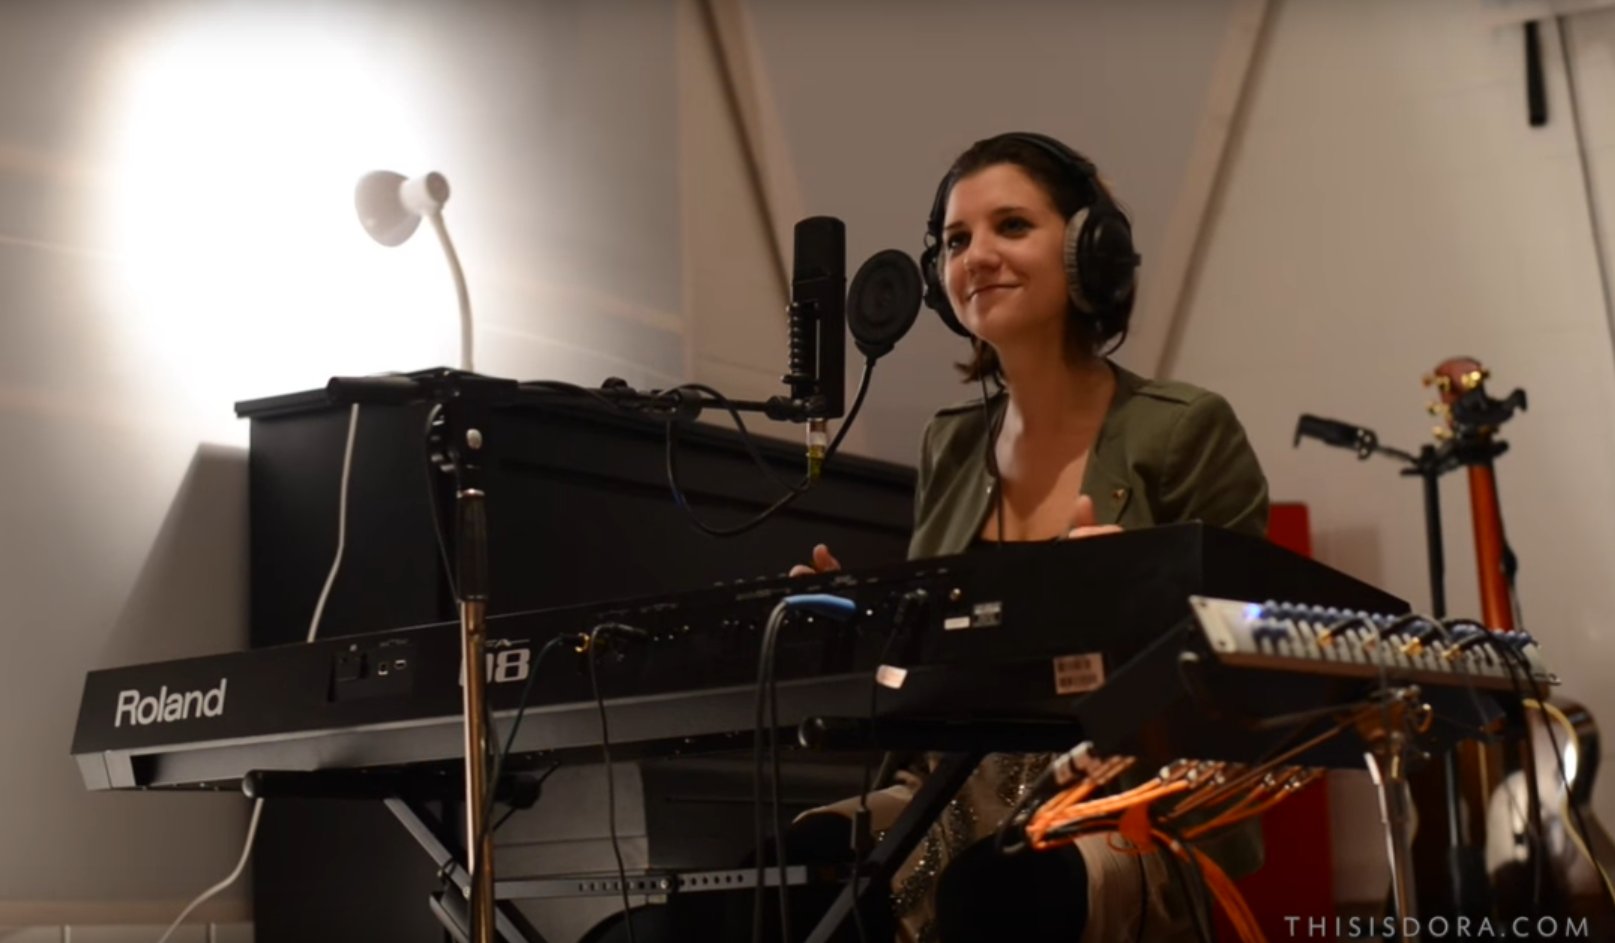 2017-04-06 11_21_00-Dora Live Studio Sessions Budapest - YouTube.png